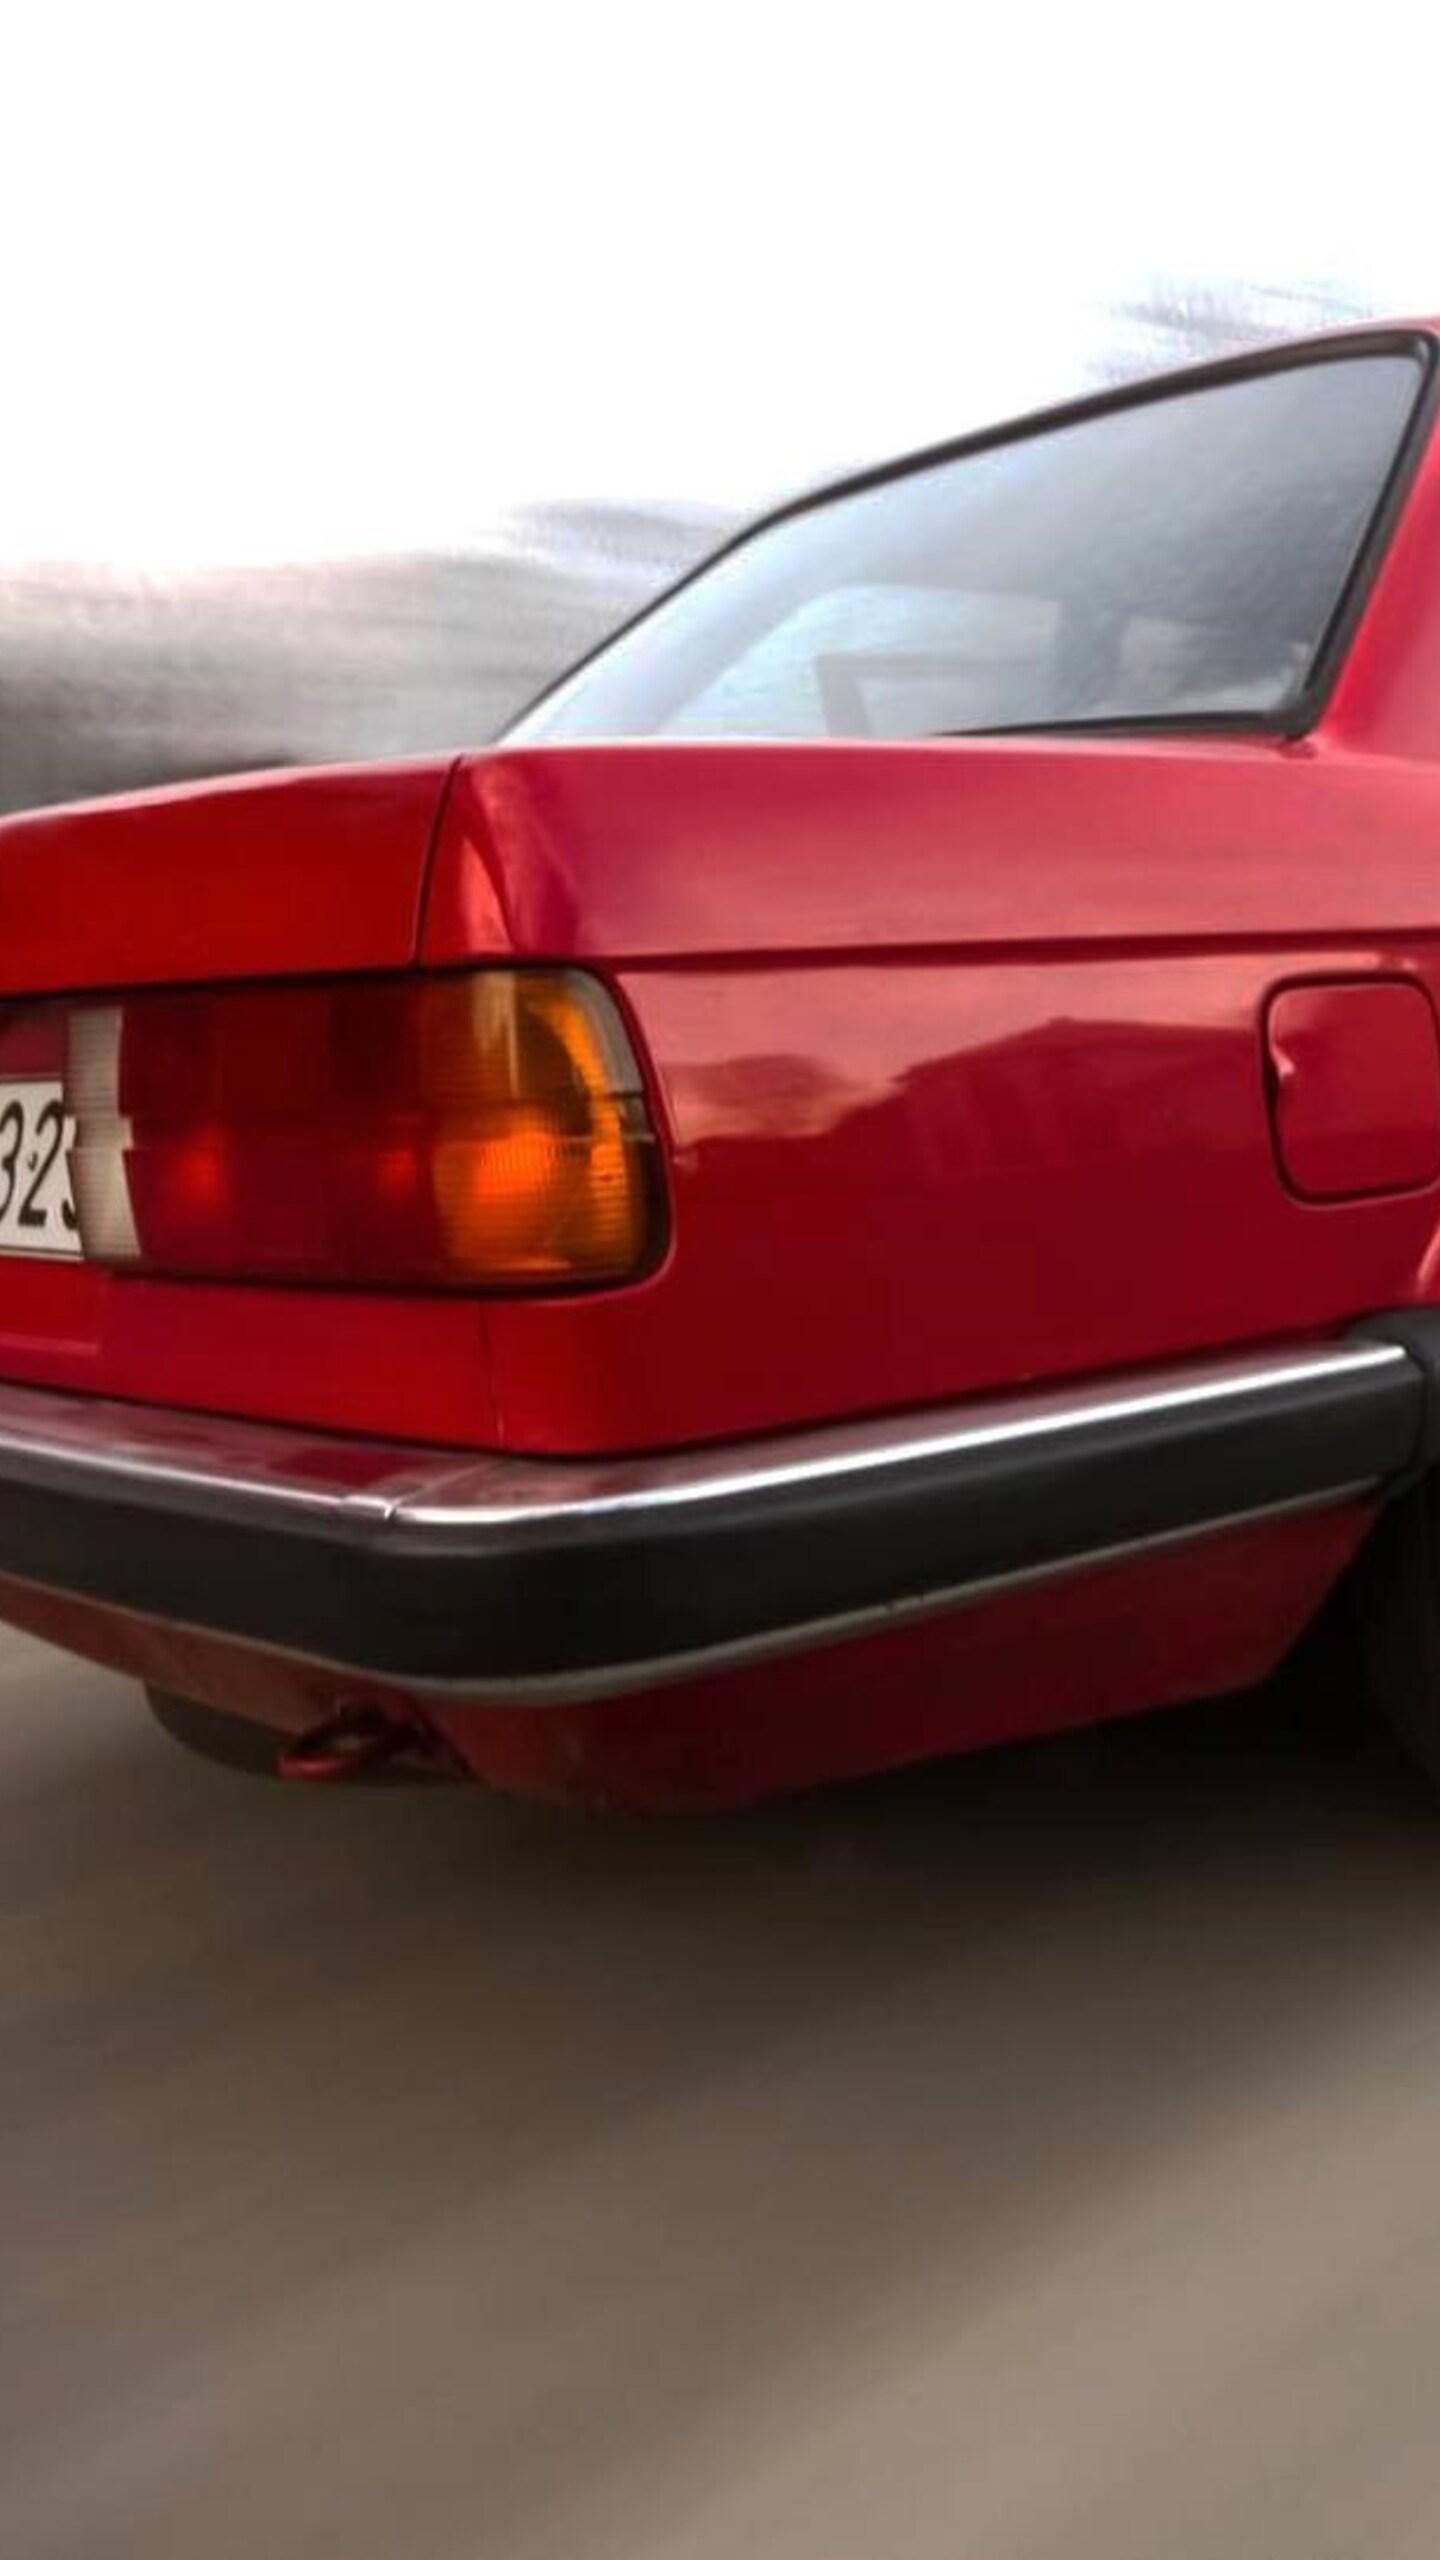 1440x2560 BMW E30 Old Sport Car Samsung Galaxy S6,S7 ,Google Pixel ...